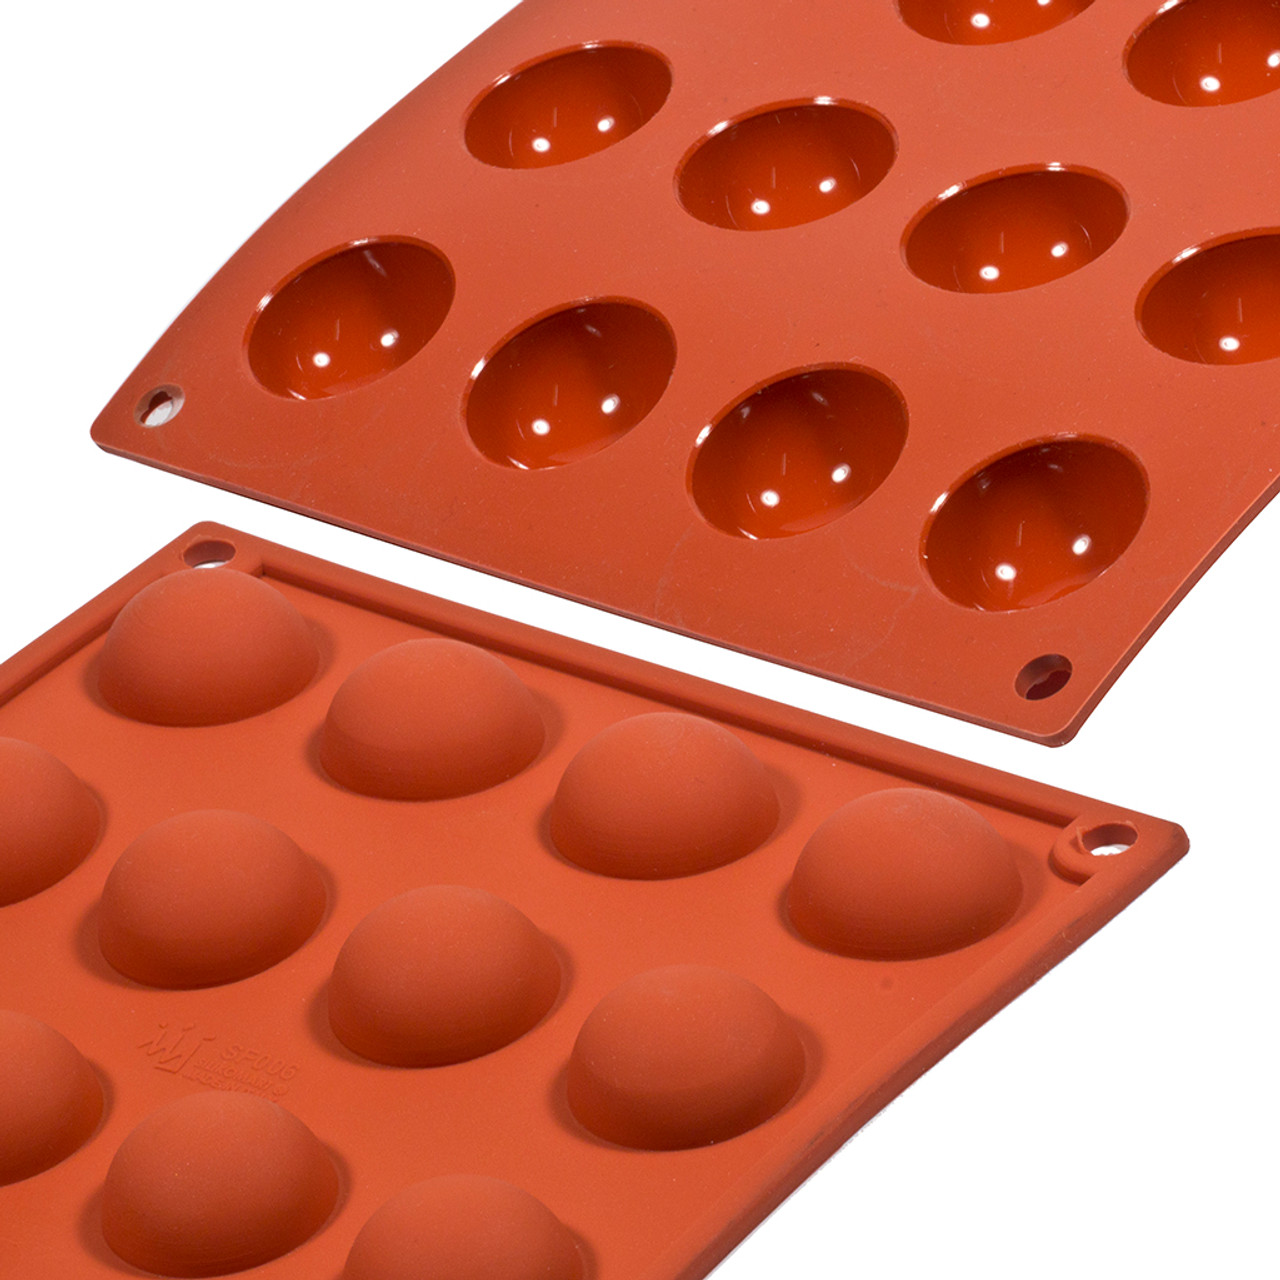 Silicon Mould - Hemisphere Mini x 24's